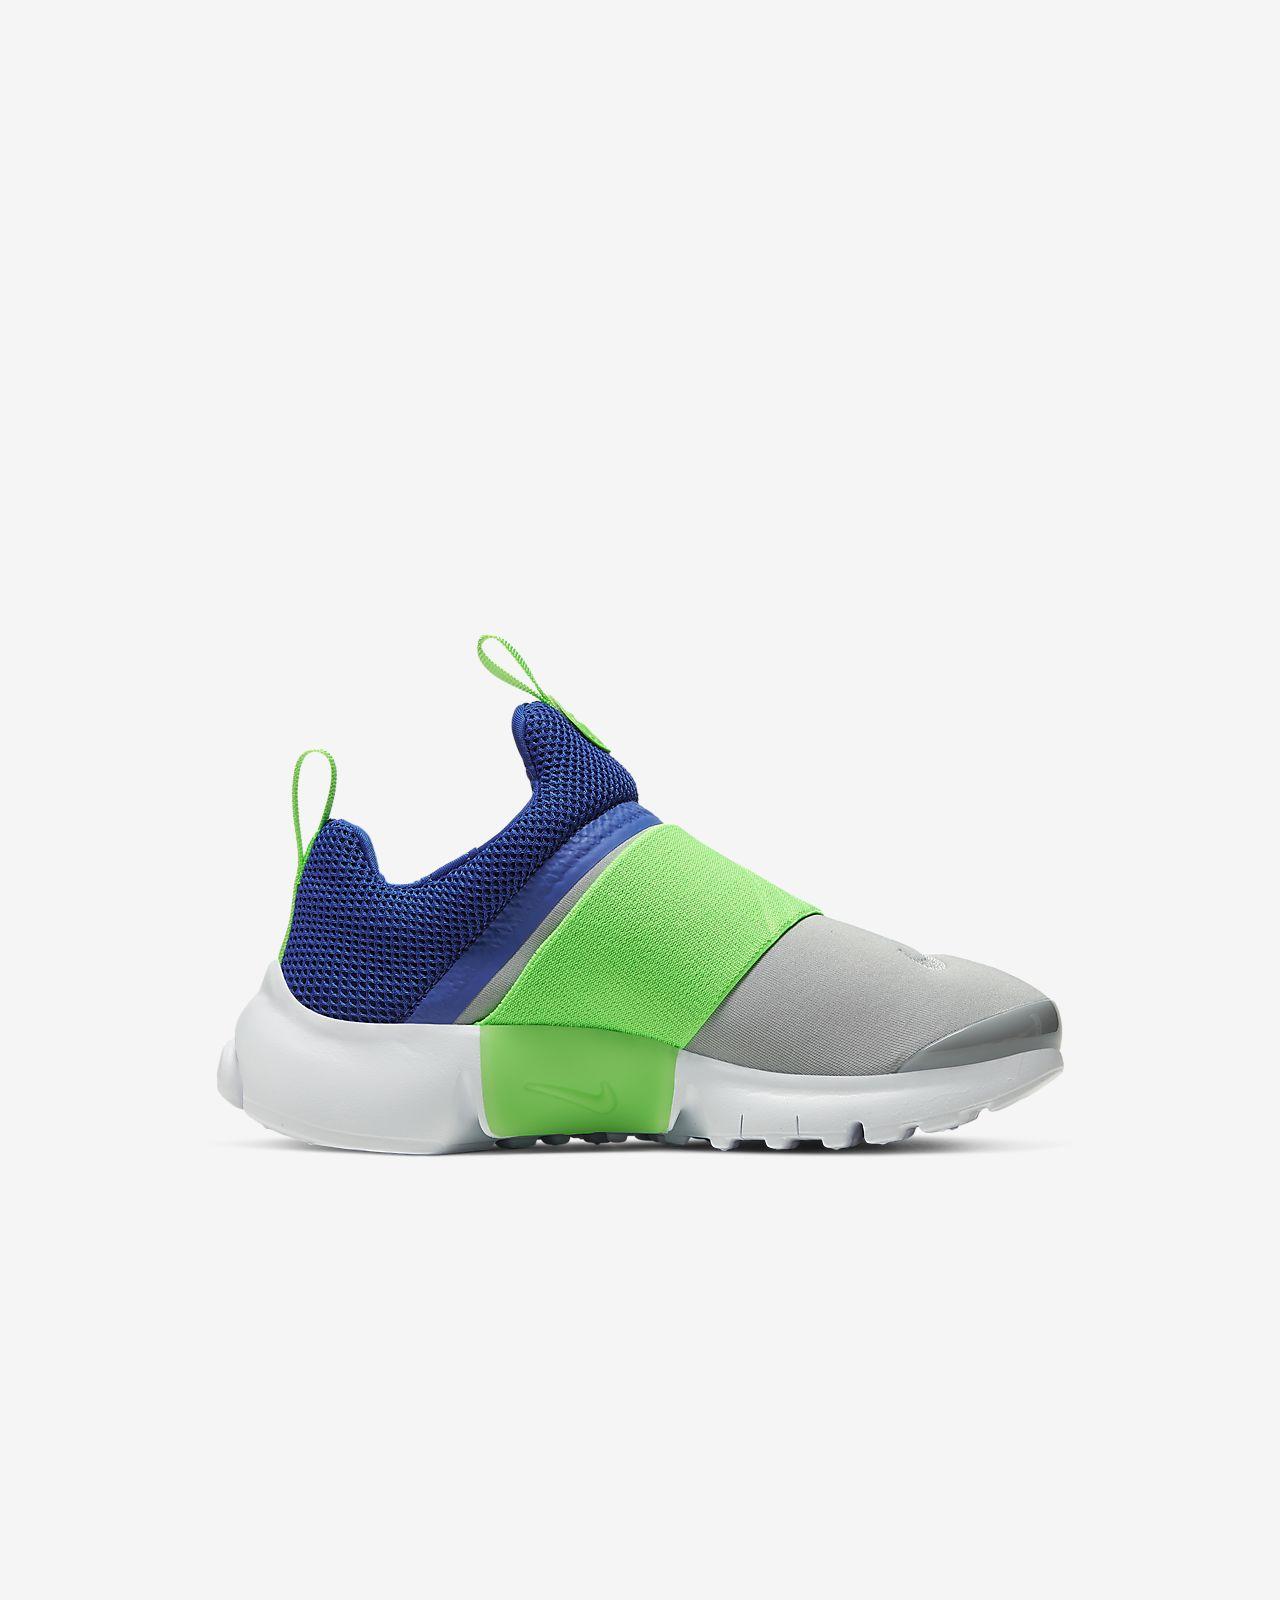 check out ac096 e69dc ... Nike Presto Extreme Little Kids  Shoe